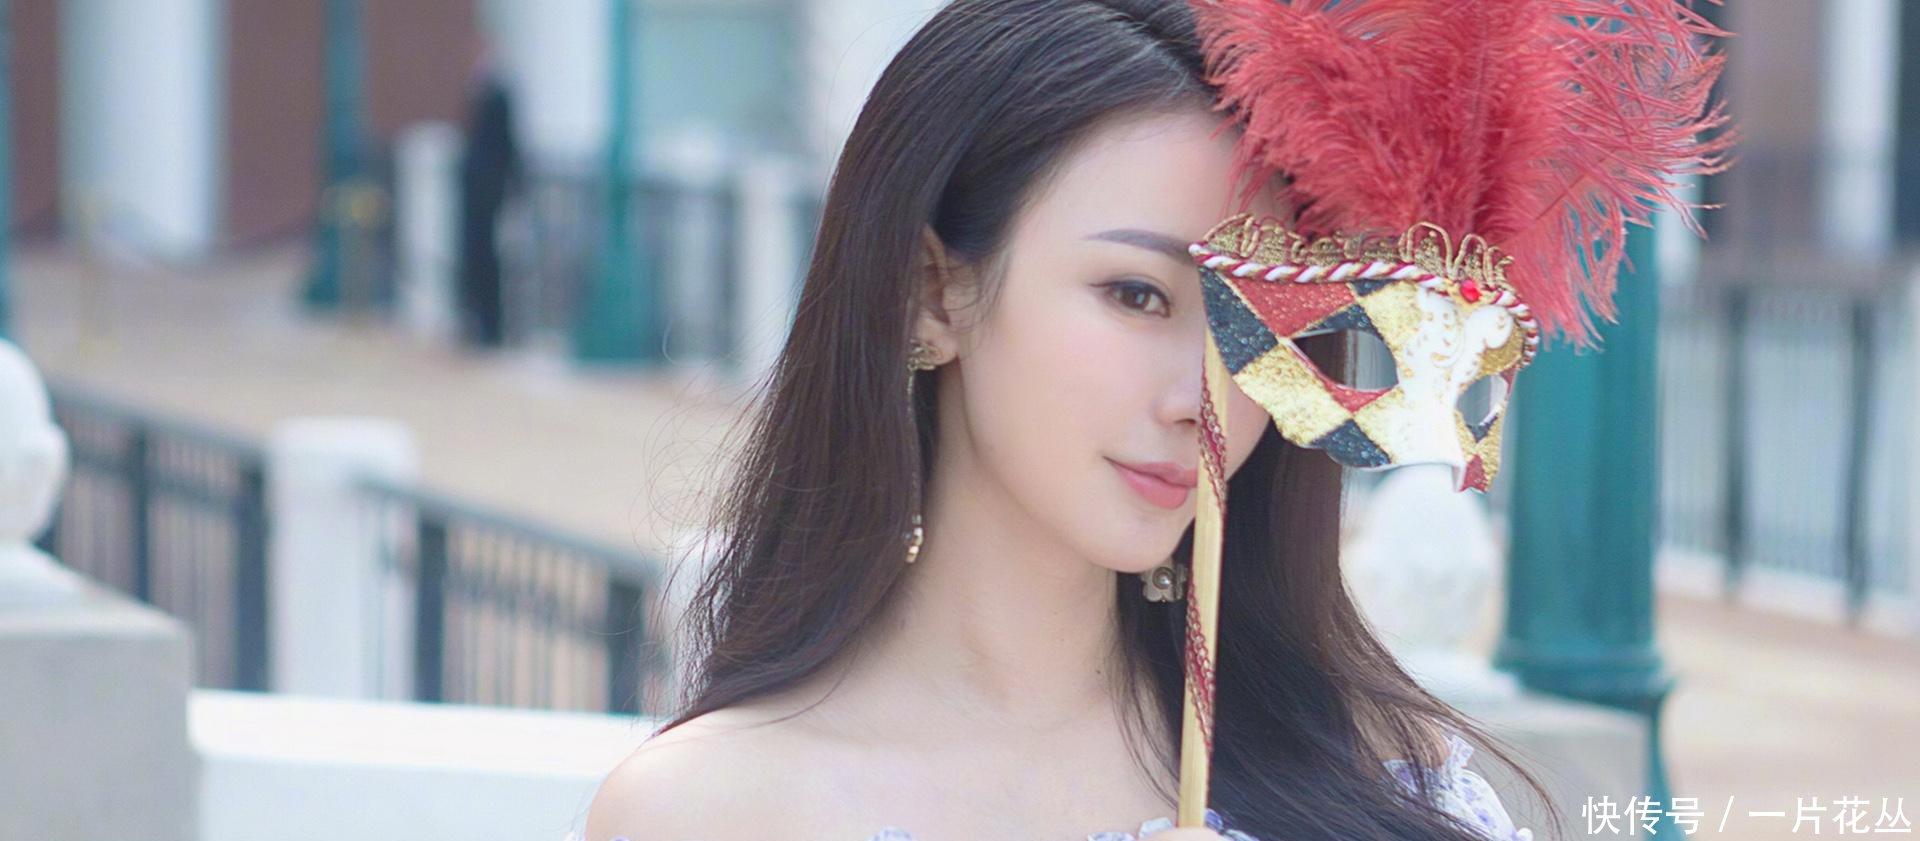 <b>2019年中旬生肖运势,属鸡、属狗、属牛、属龙(运势3)</b>